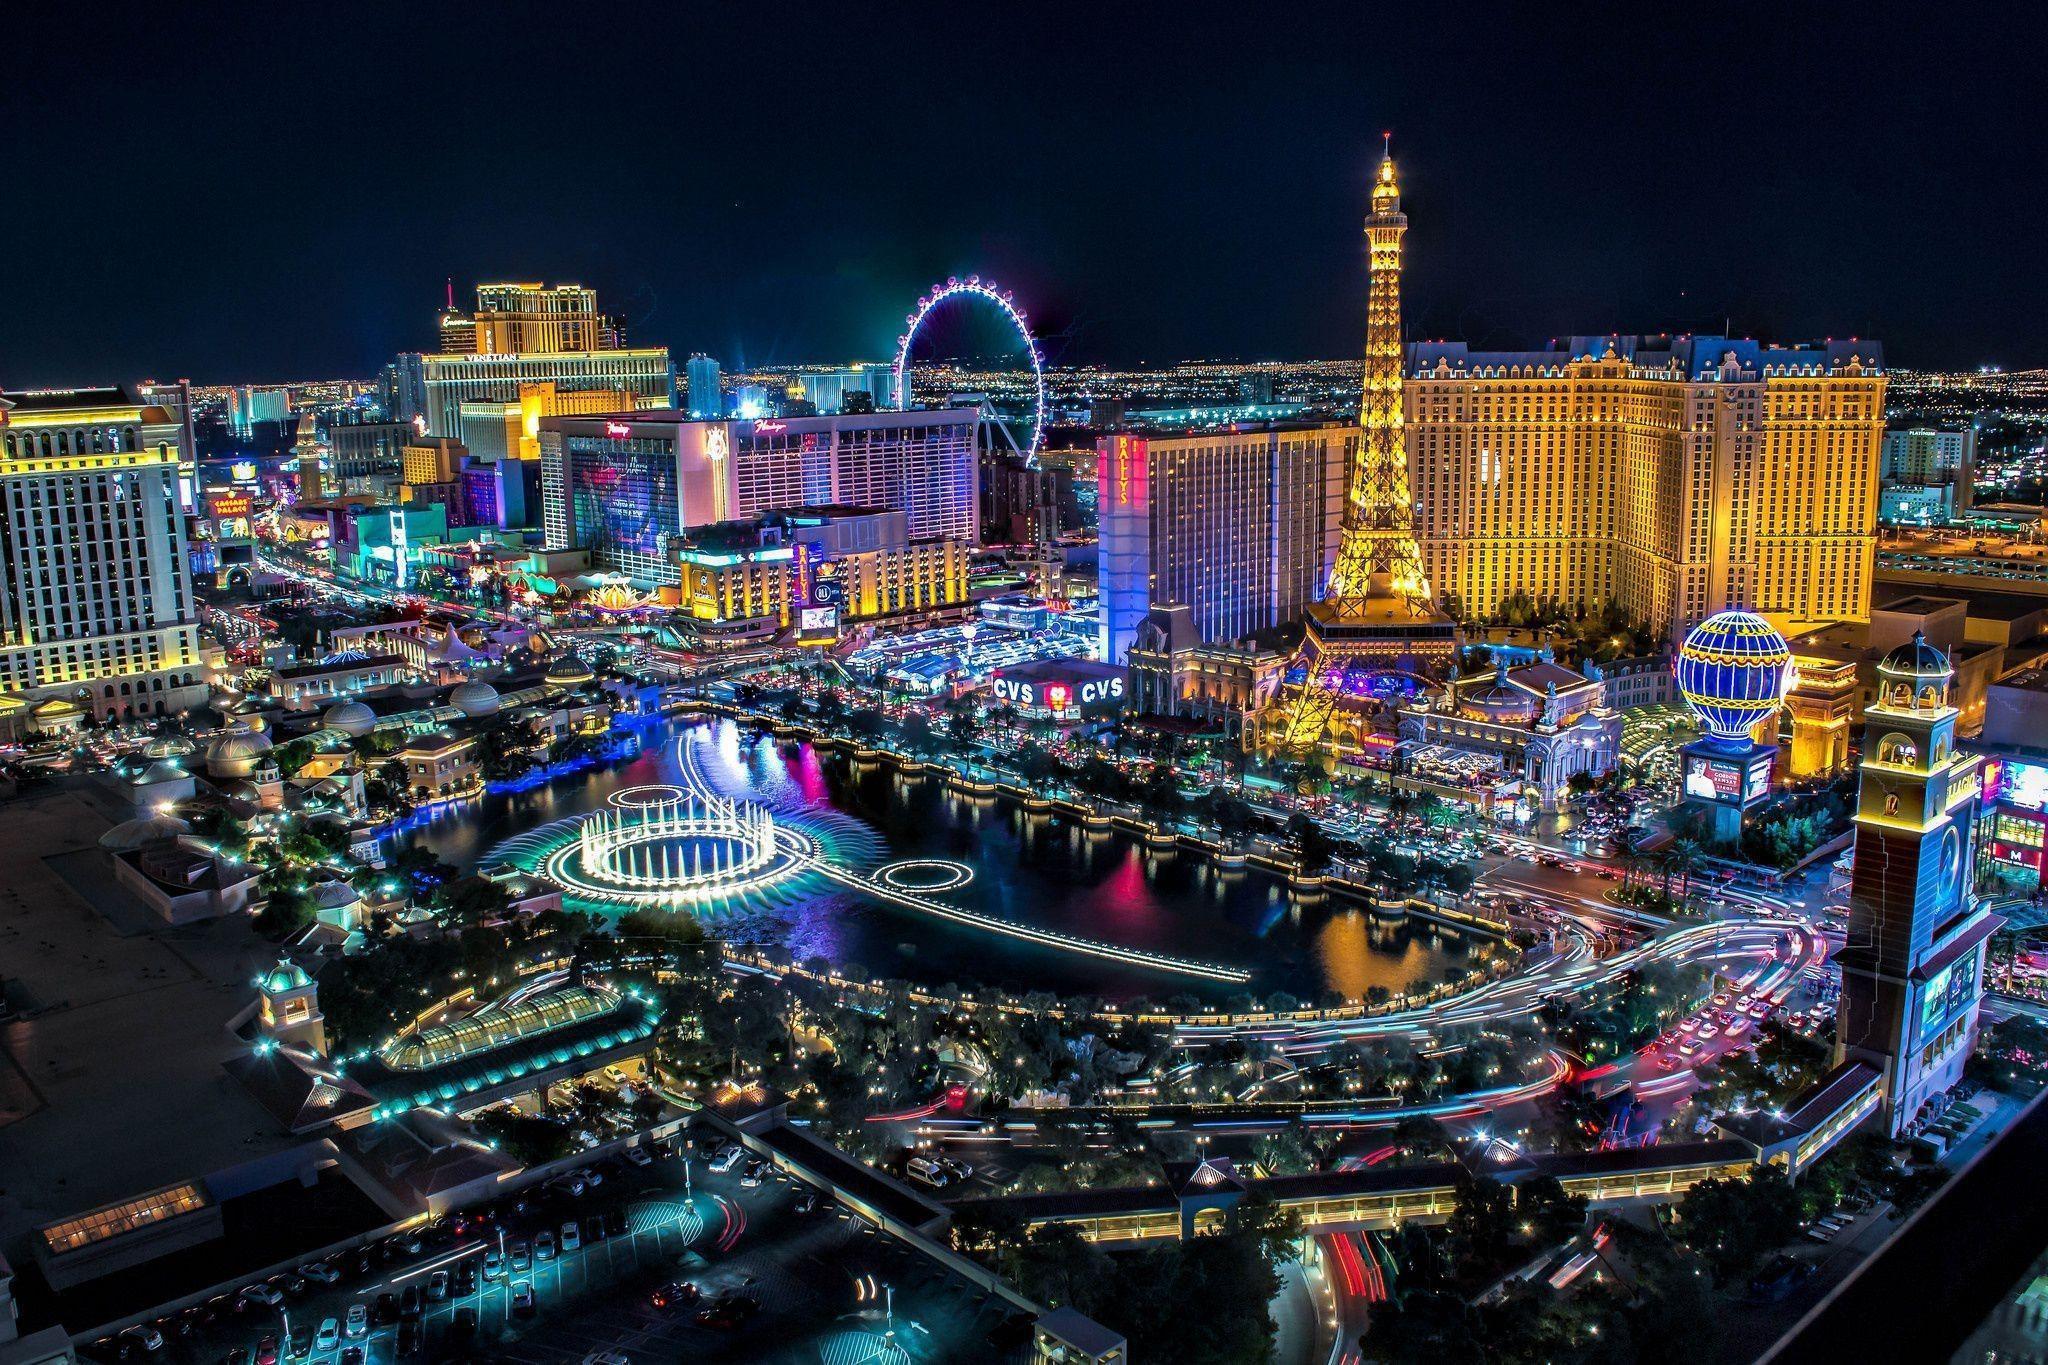 Vegas 4k Wallpapers Top Free Vegas 4k Backgrounds Wallpaperaccess